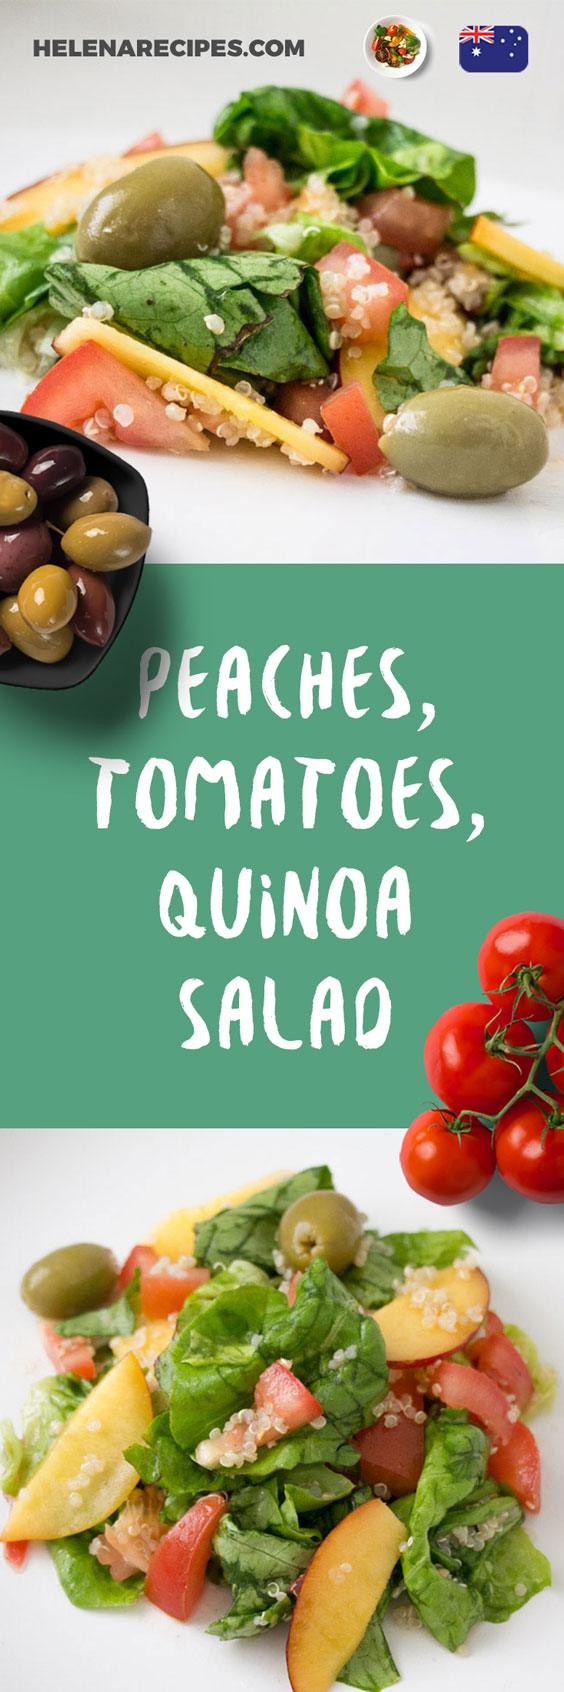 Peaches, Tomatoes, Quinoa Salad for Pinterest